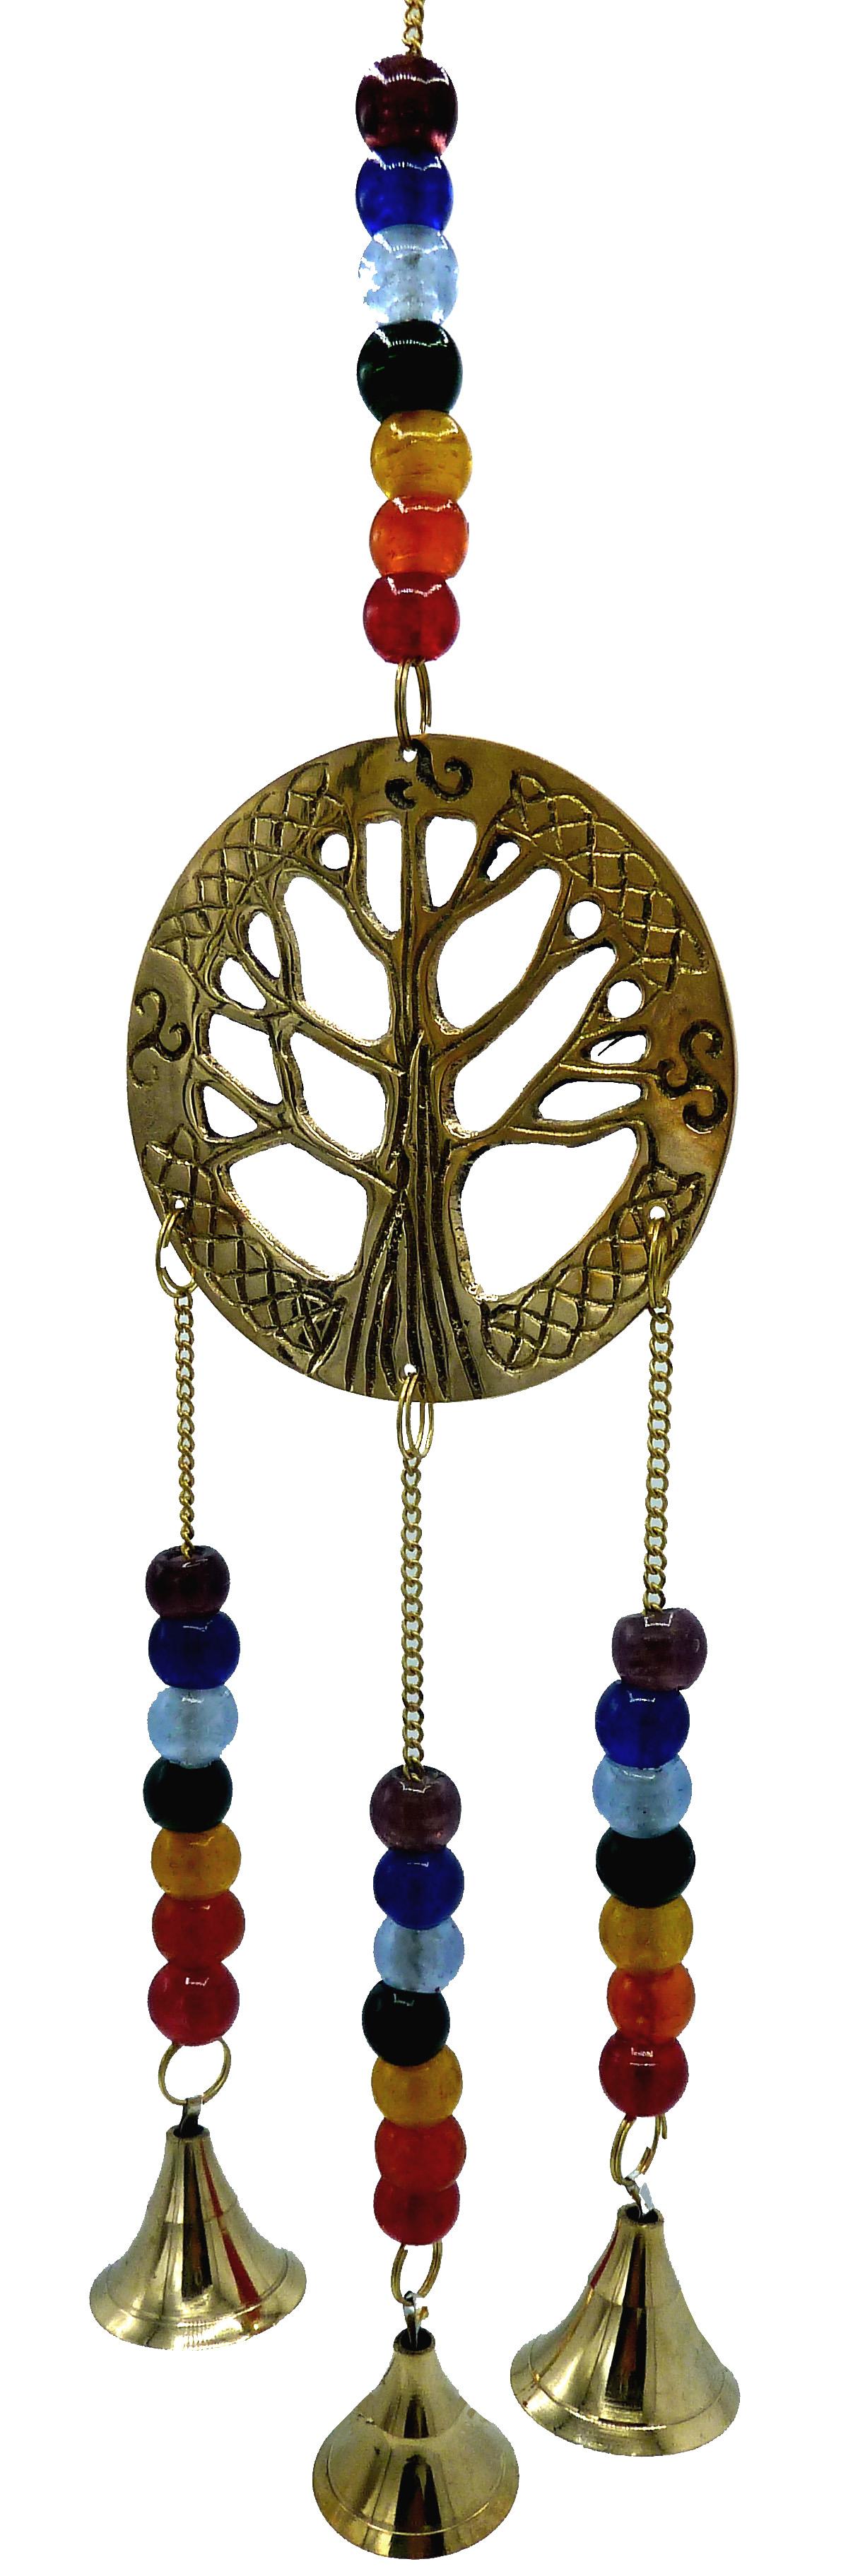 Carillon cuivre arbre de vie perles & cloches 36cm